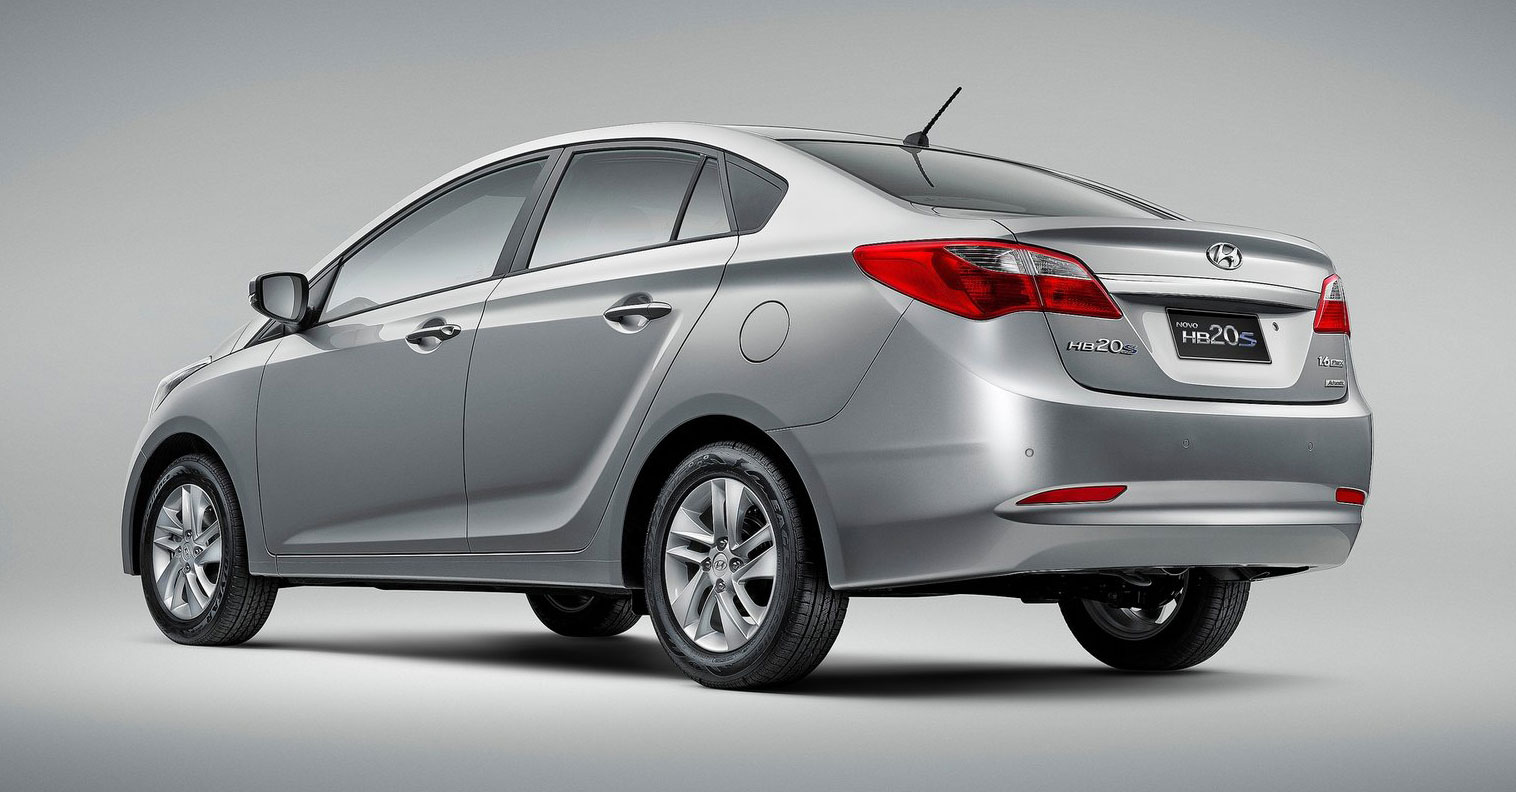 Hyundai Hb20s B Segment Sedan For Brazil Image 159484